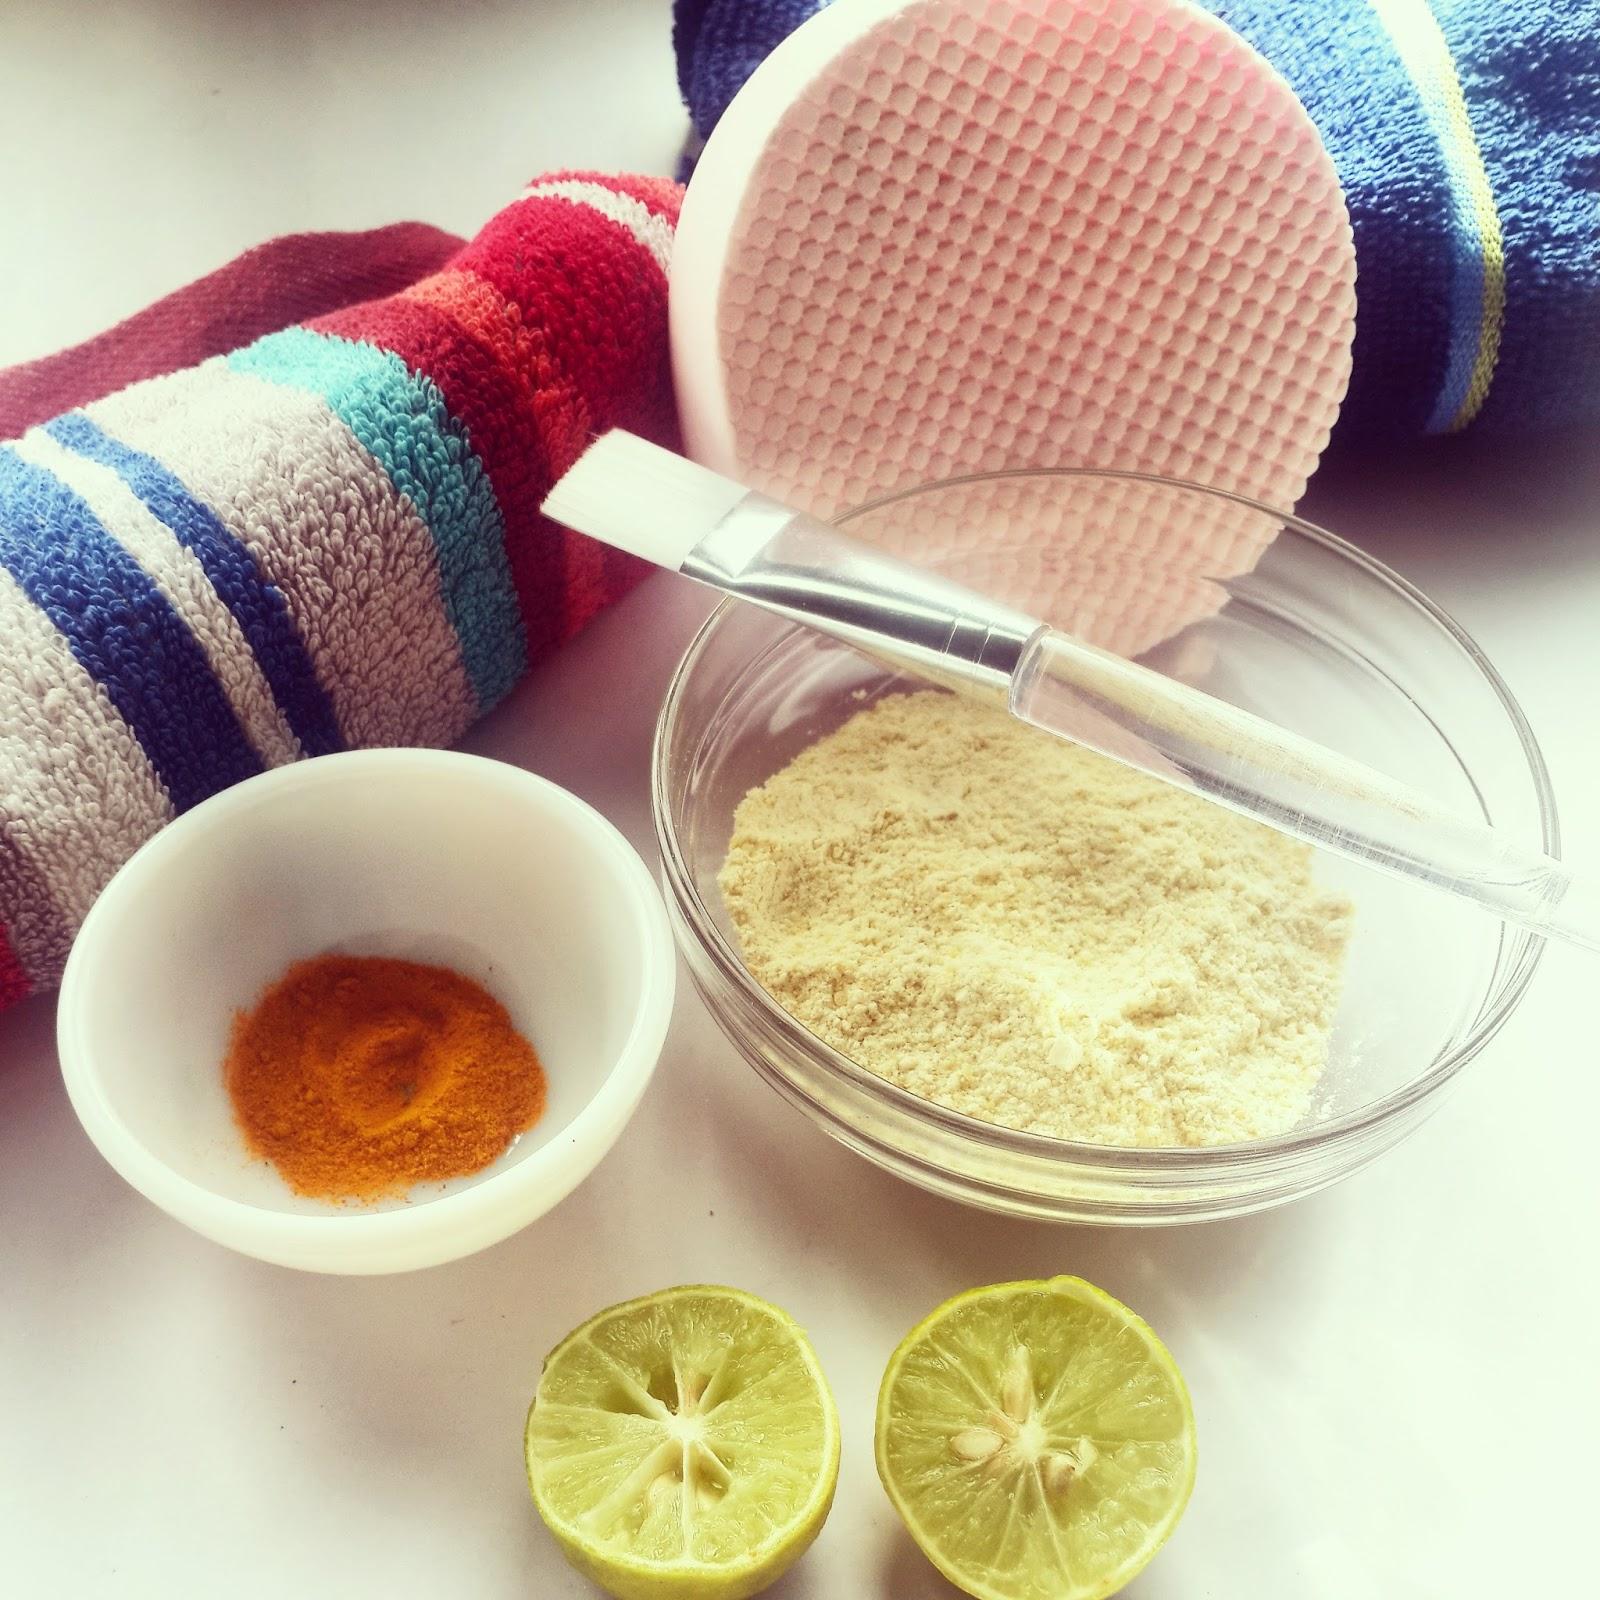 Diy Skin Care: RIDZI MAKEUP: The Best Homemade Skin Care Recepie